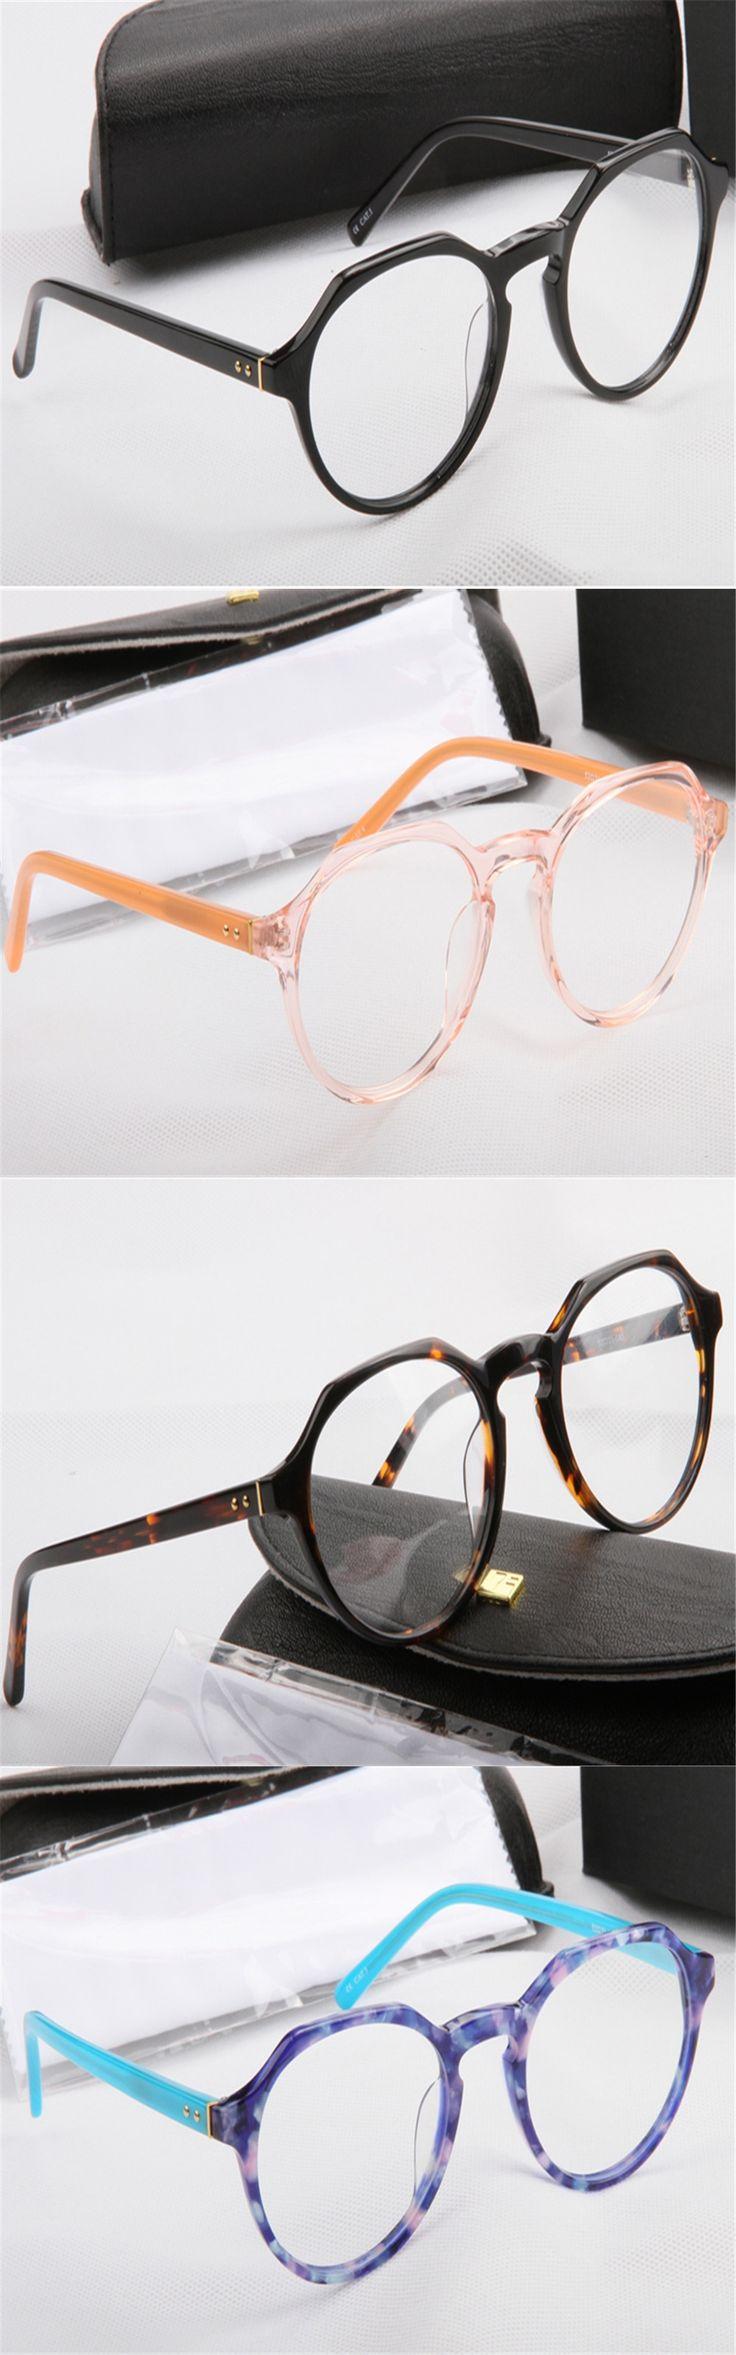 DOWER ME Vintage Fashion Unisex Full Rim Acetate Round Frame Myopia Optical Eyewear Vision protection Eyeglass